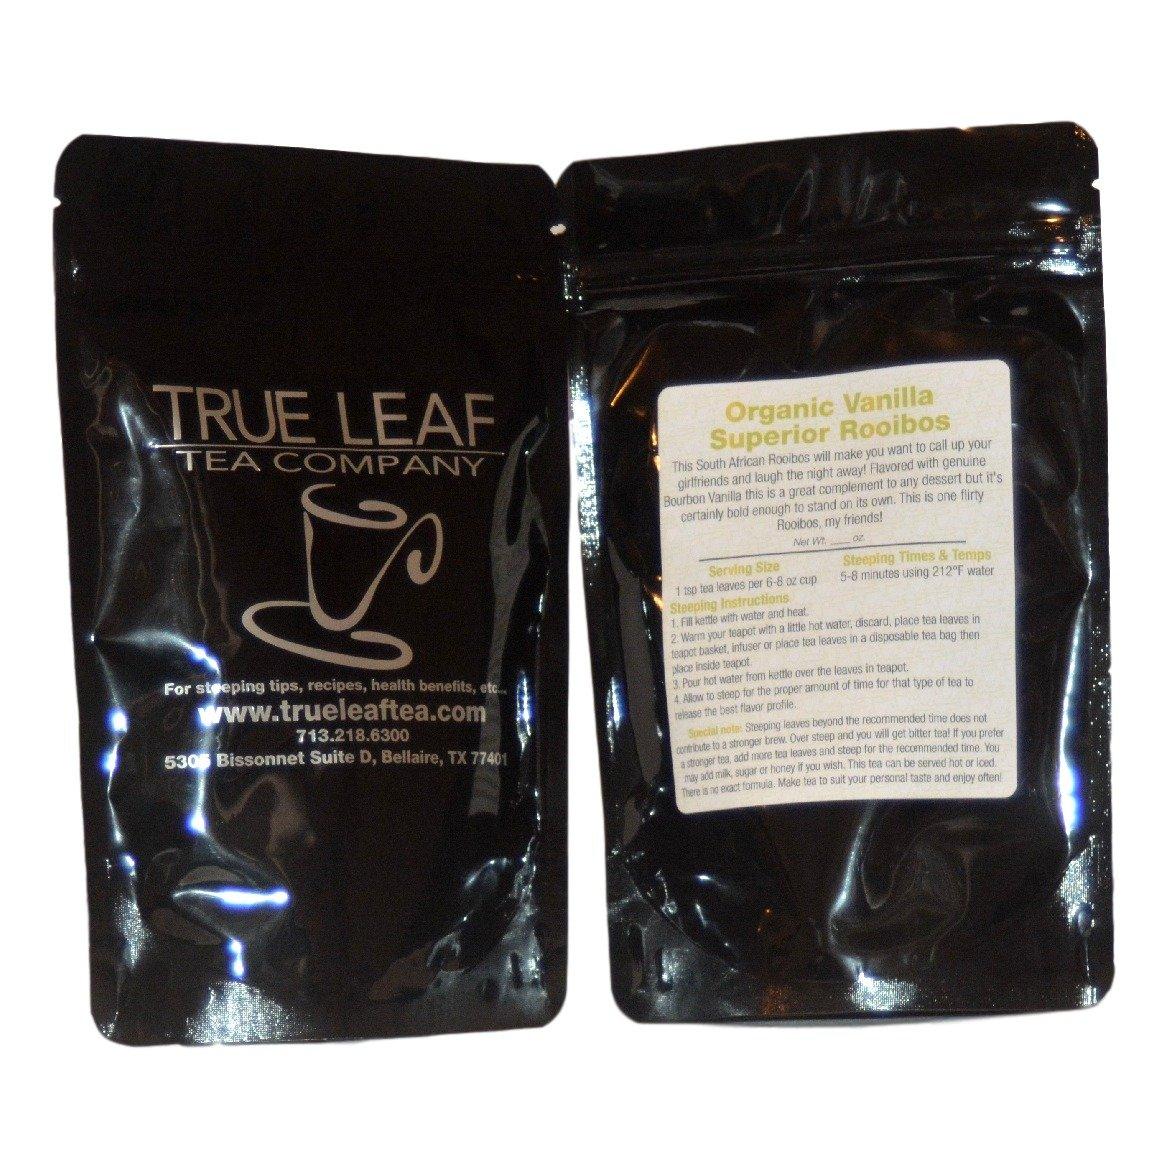 True Leaf Tea Organic Vanilla Superior Rooibos Tea 8 OZ